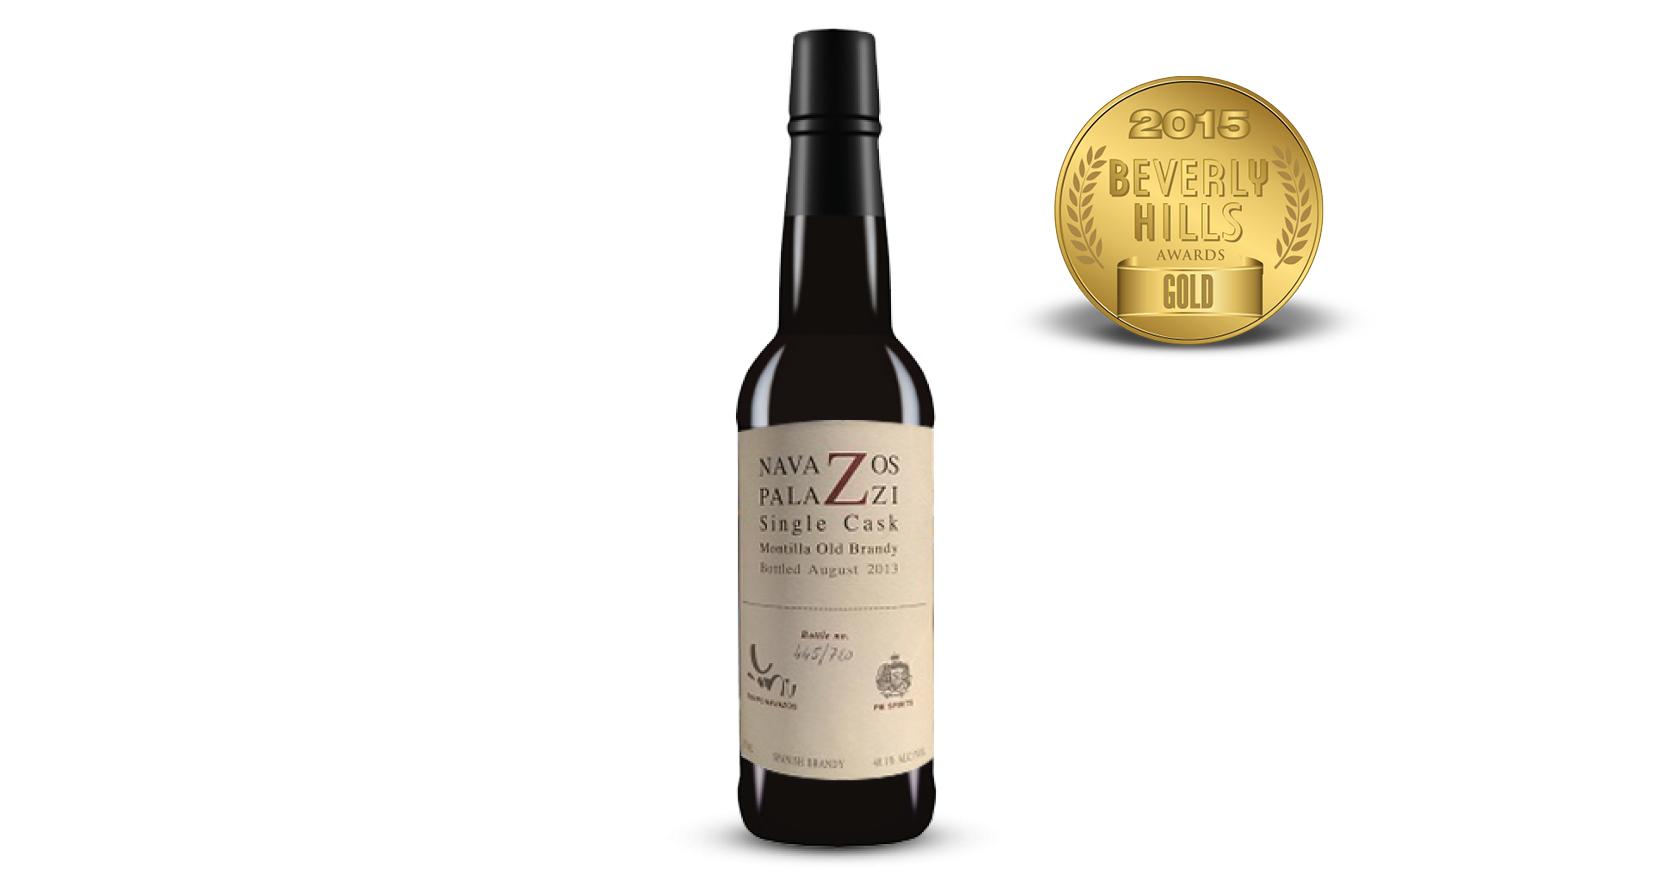 Navazos-Palazzi Jerez Brandy-Release 3 Old Montilla Single Cask